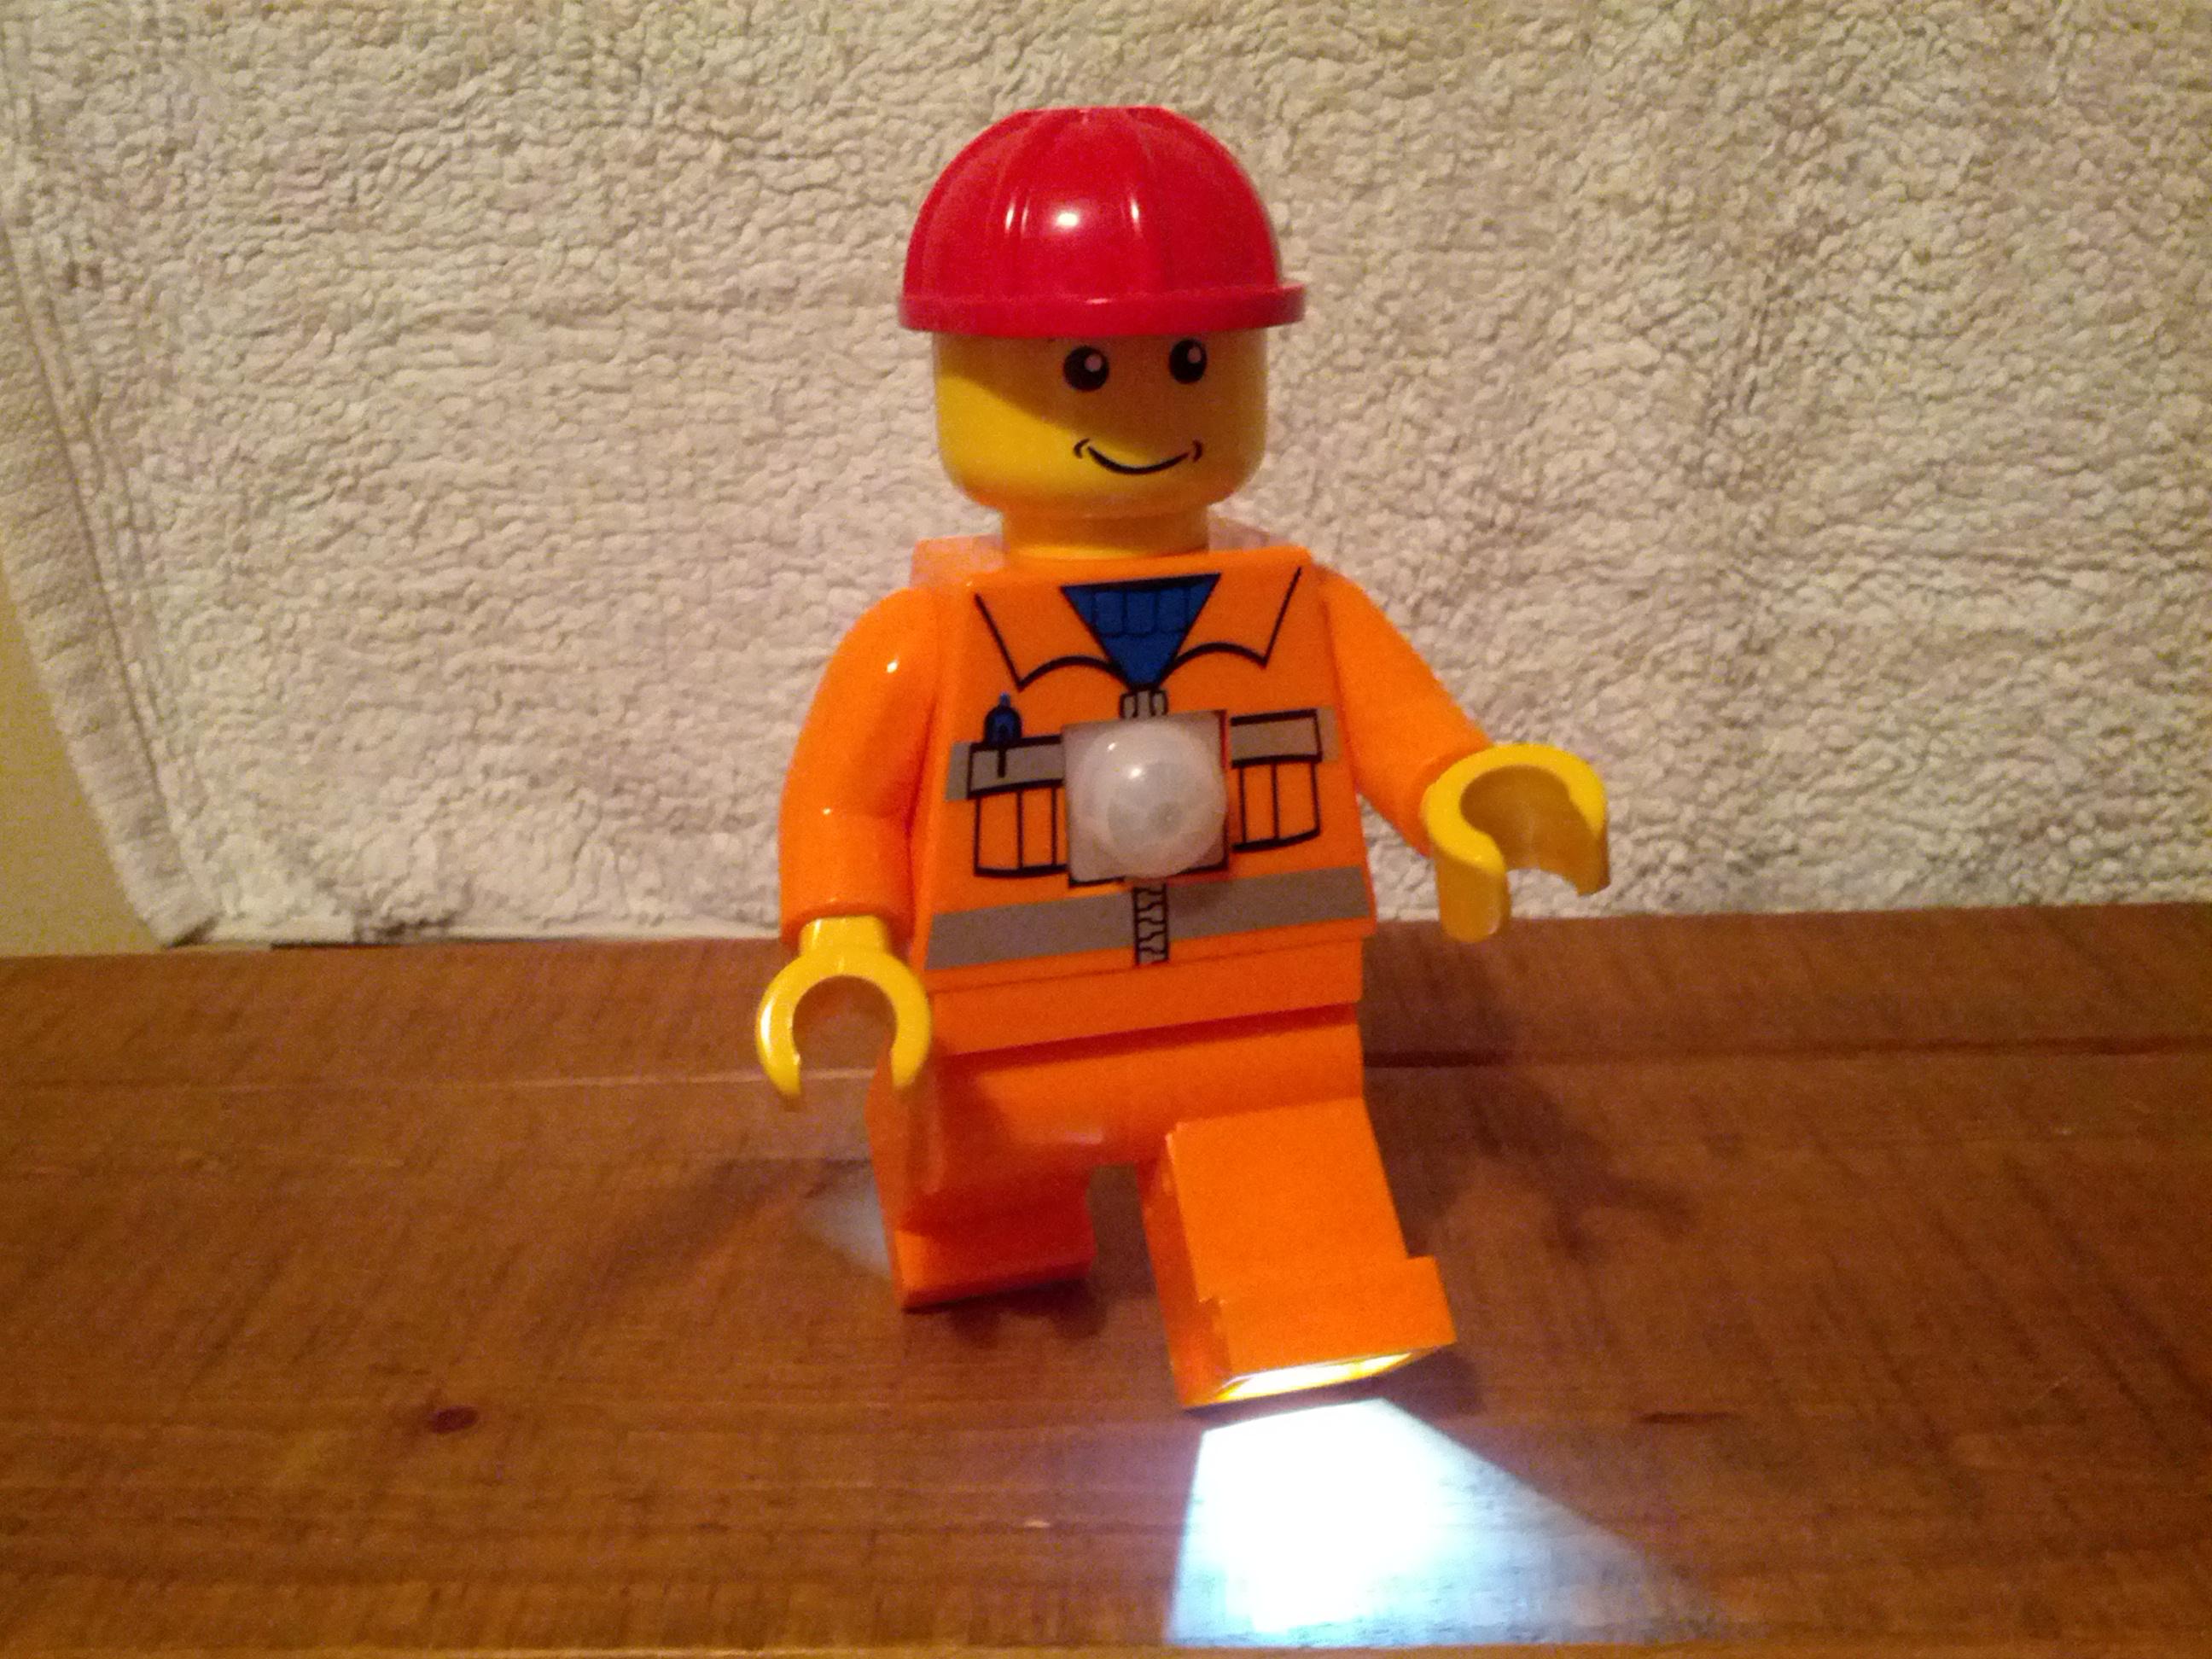 Motion sensing Lego figure nightlight